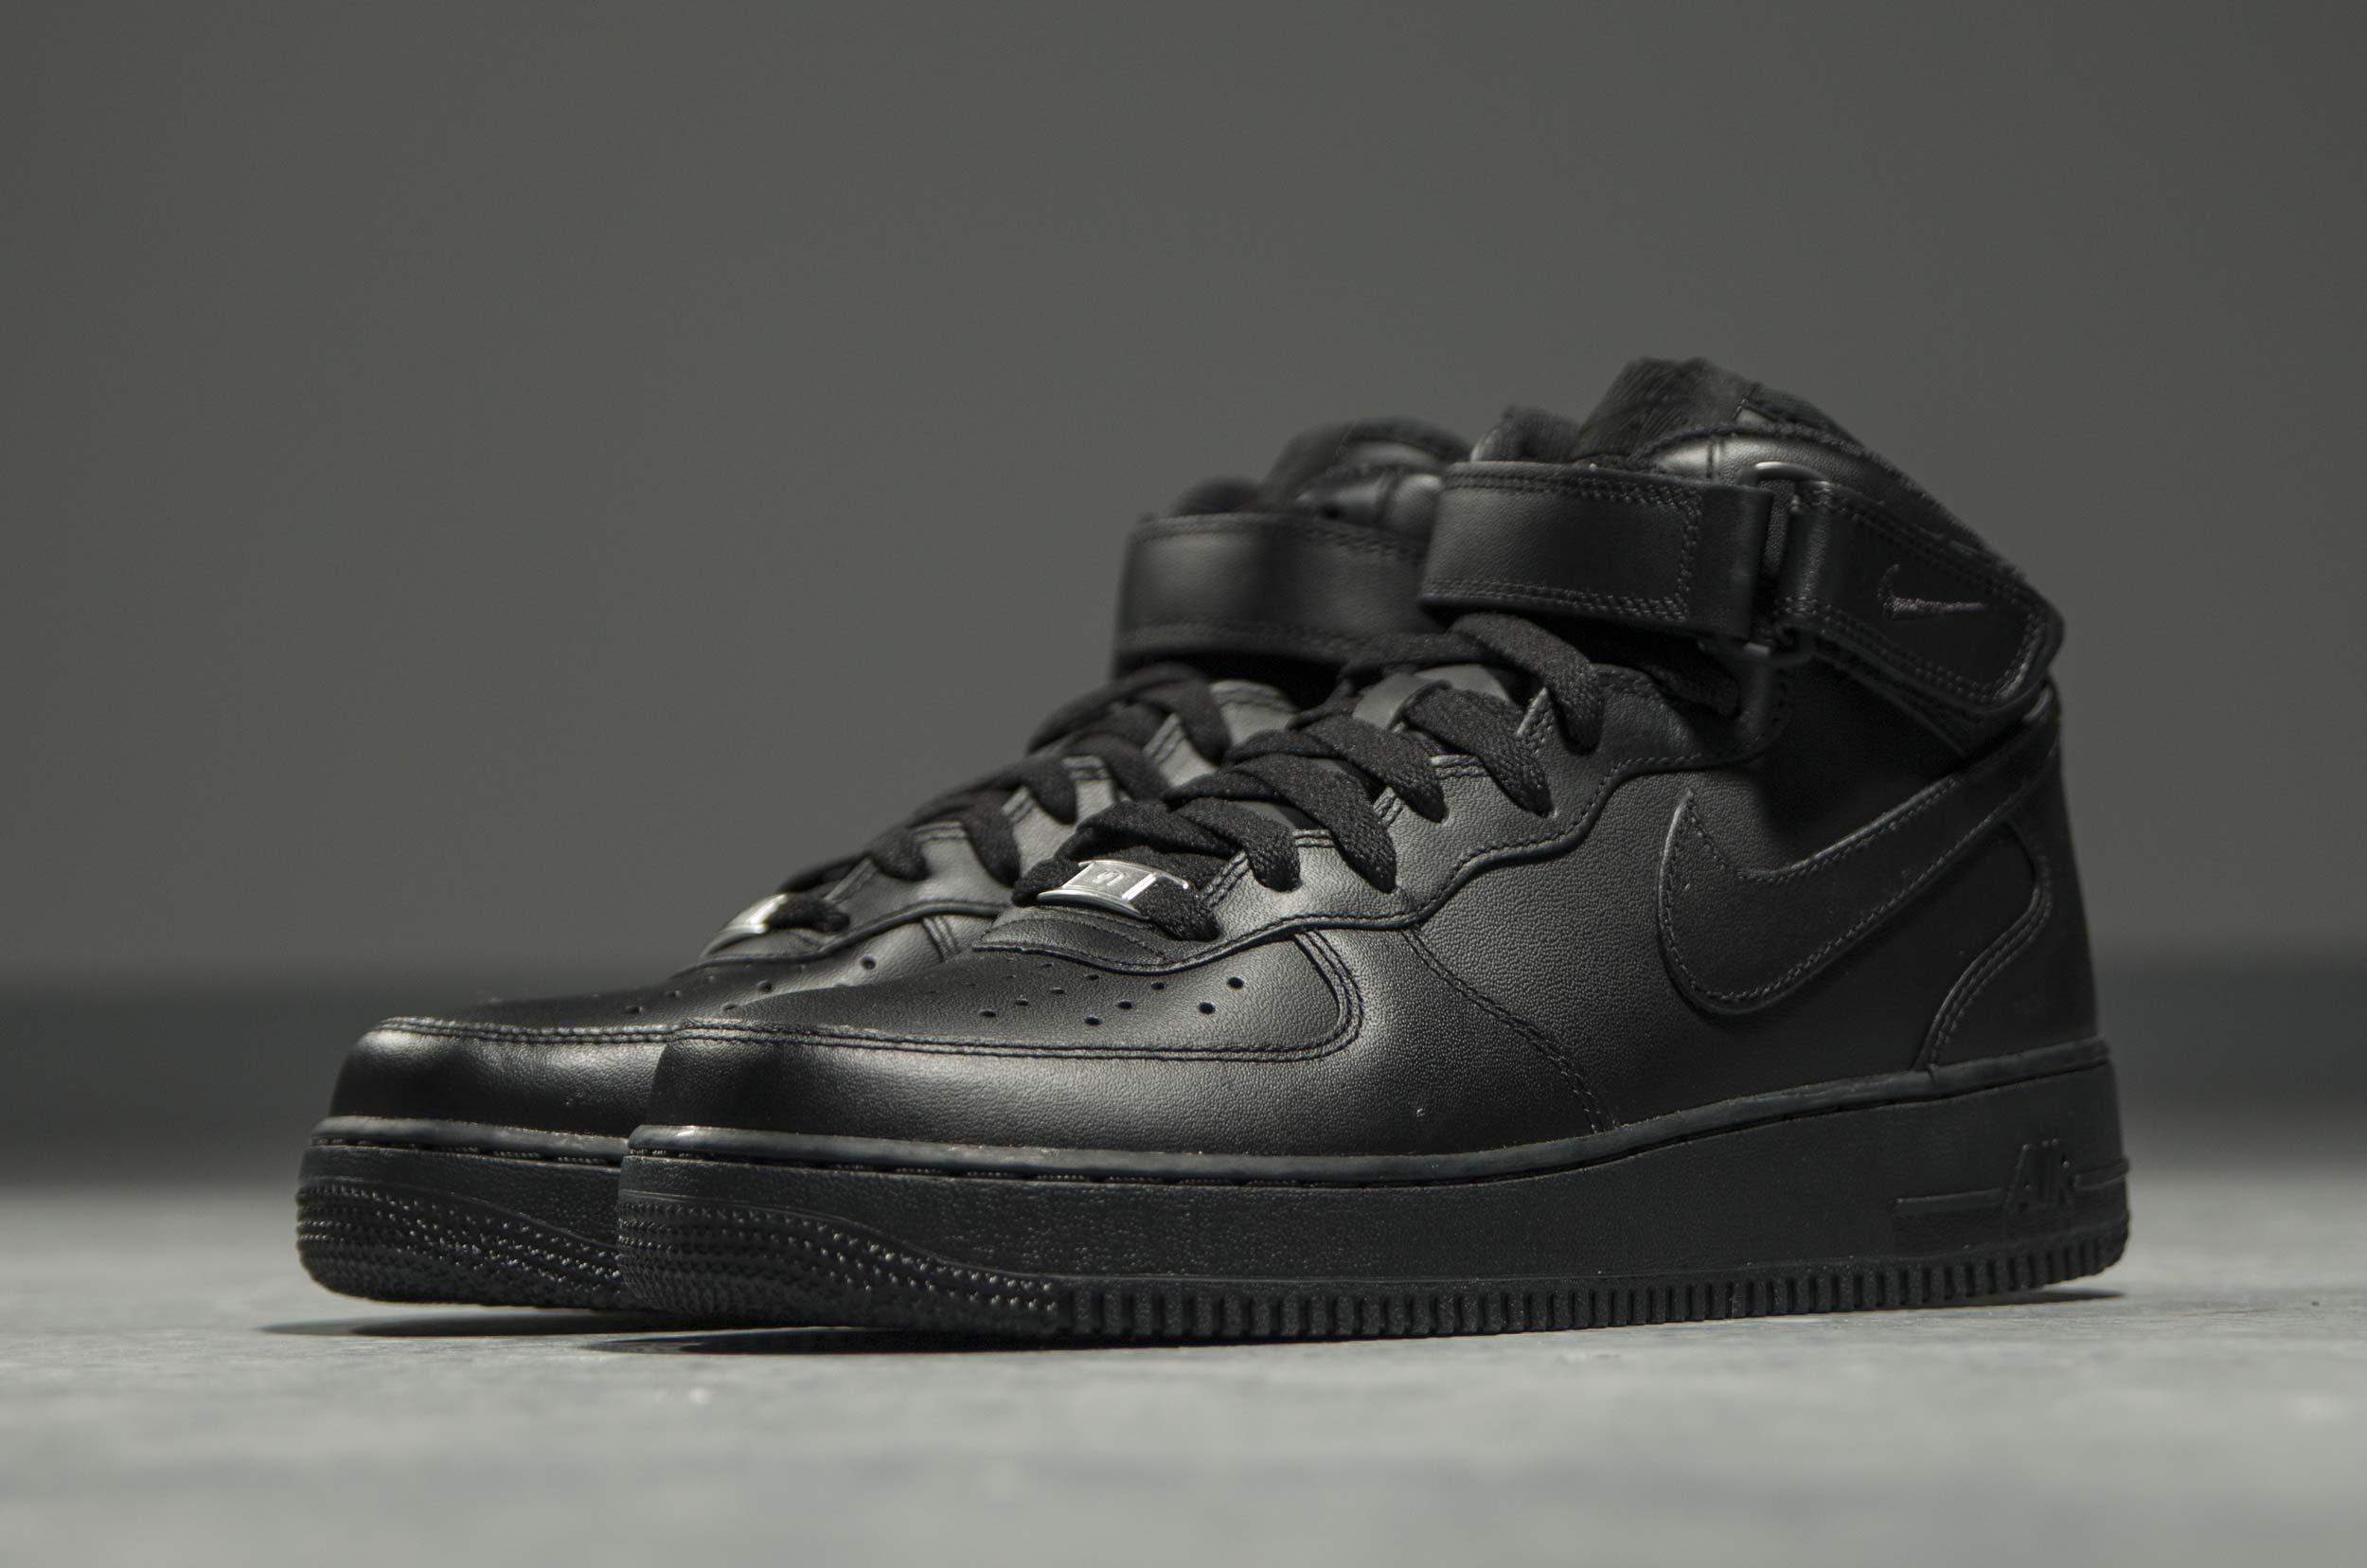 7095fde4 Купить мужские кроссовки Nike Air Force 1 Mid Leather Triple Black в ...